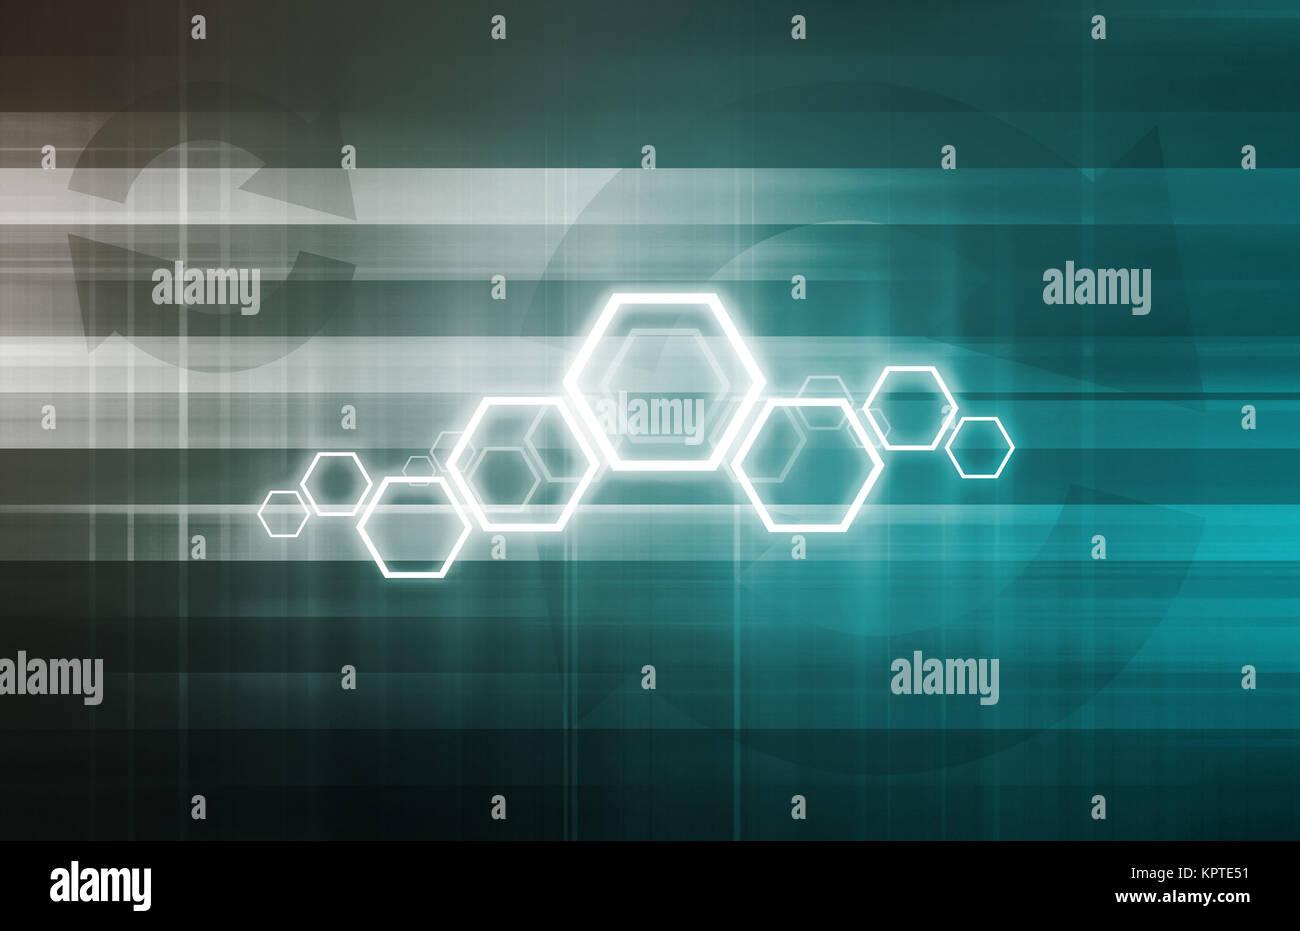 Backbone Router Stockfotos & Backbone Router Bilder - Alamy